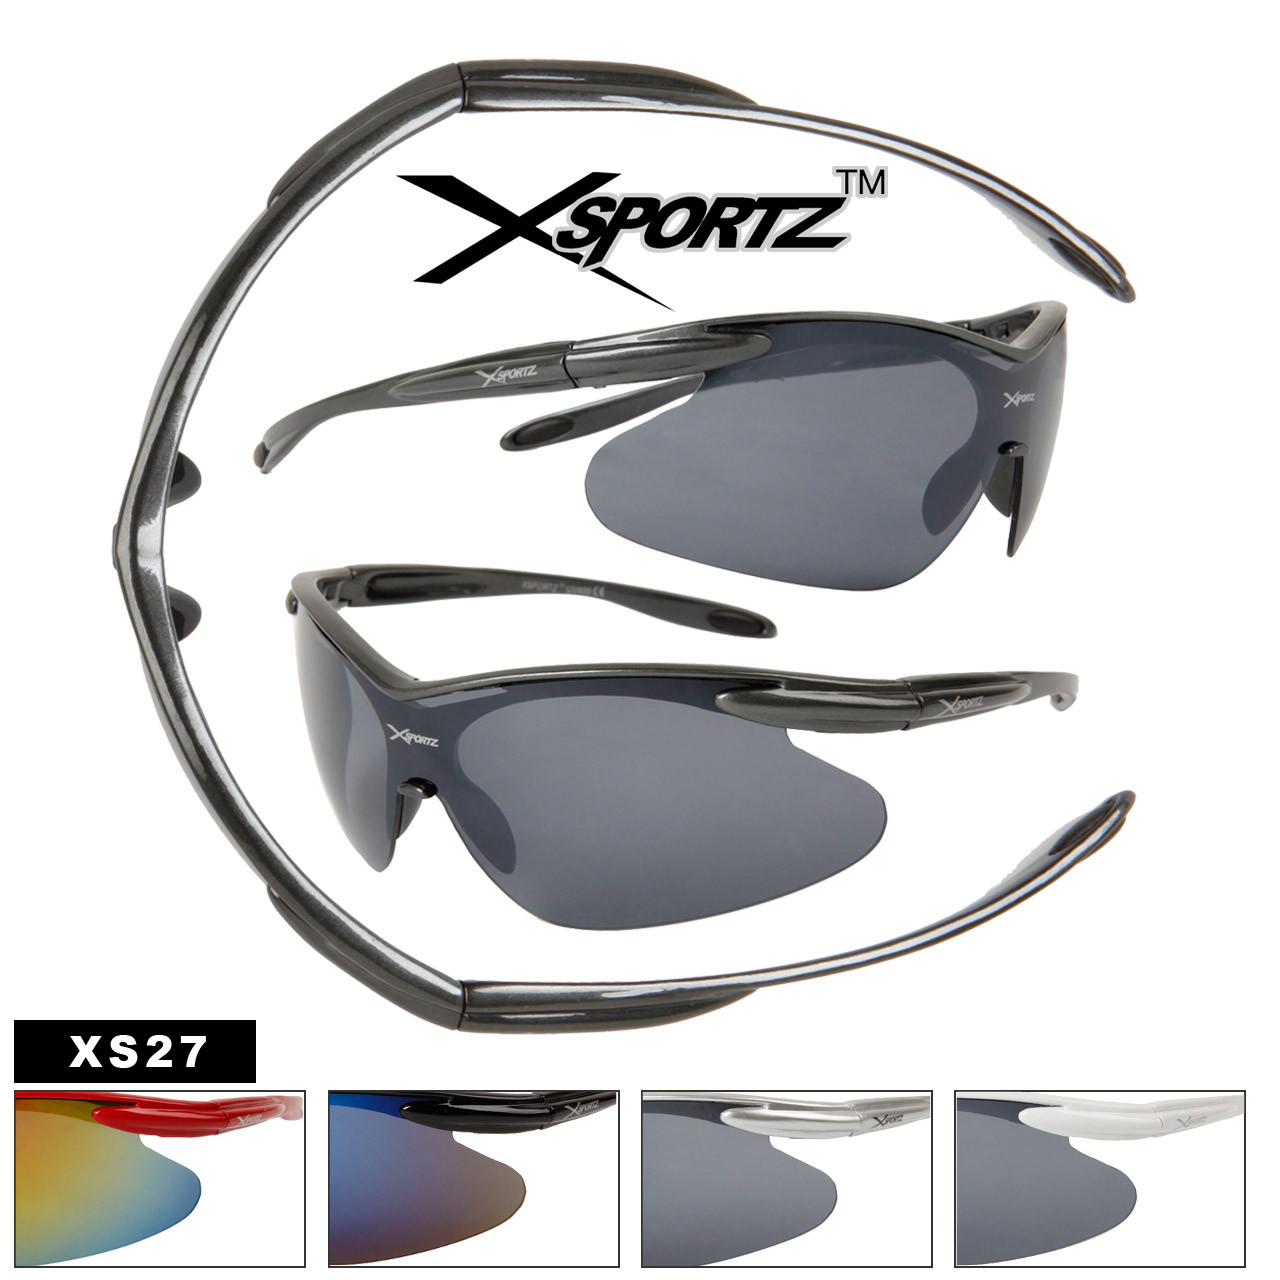 Xsportz XS27